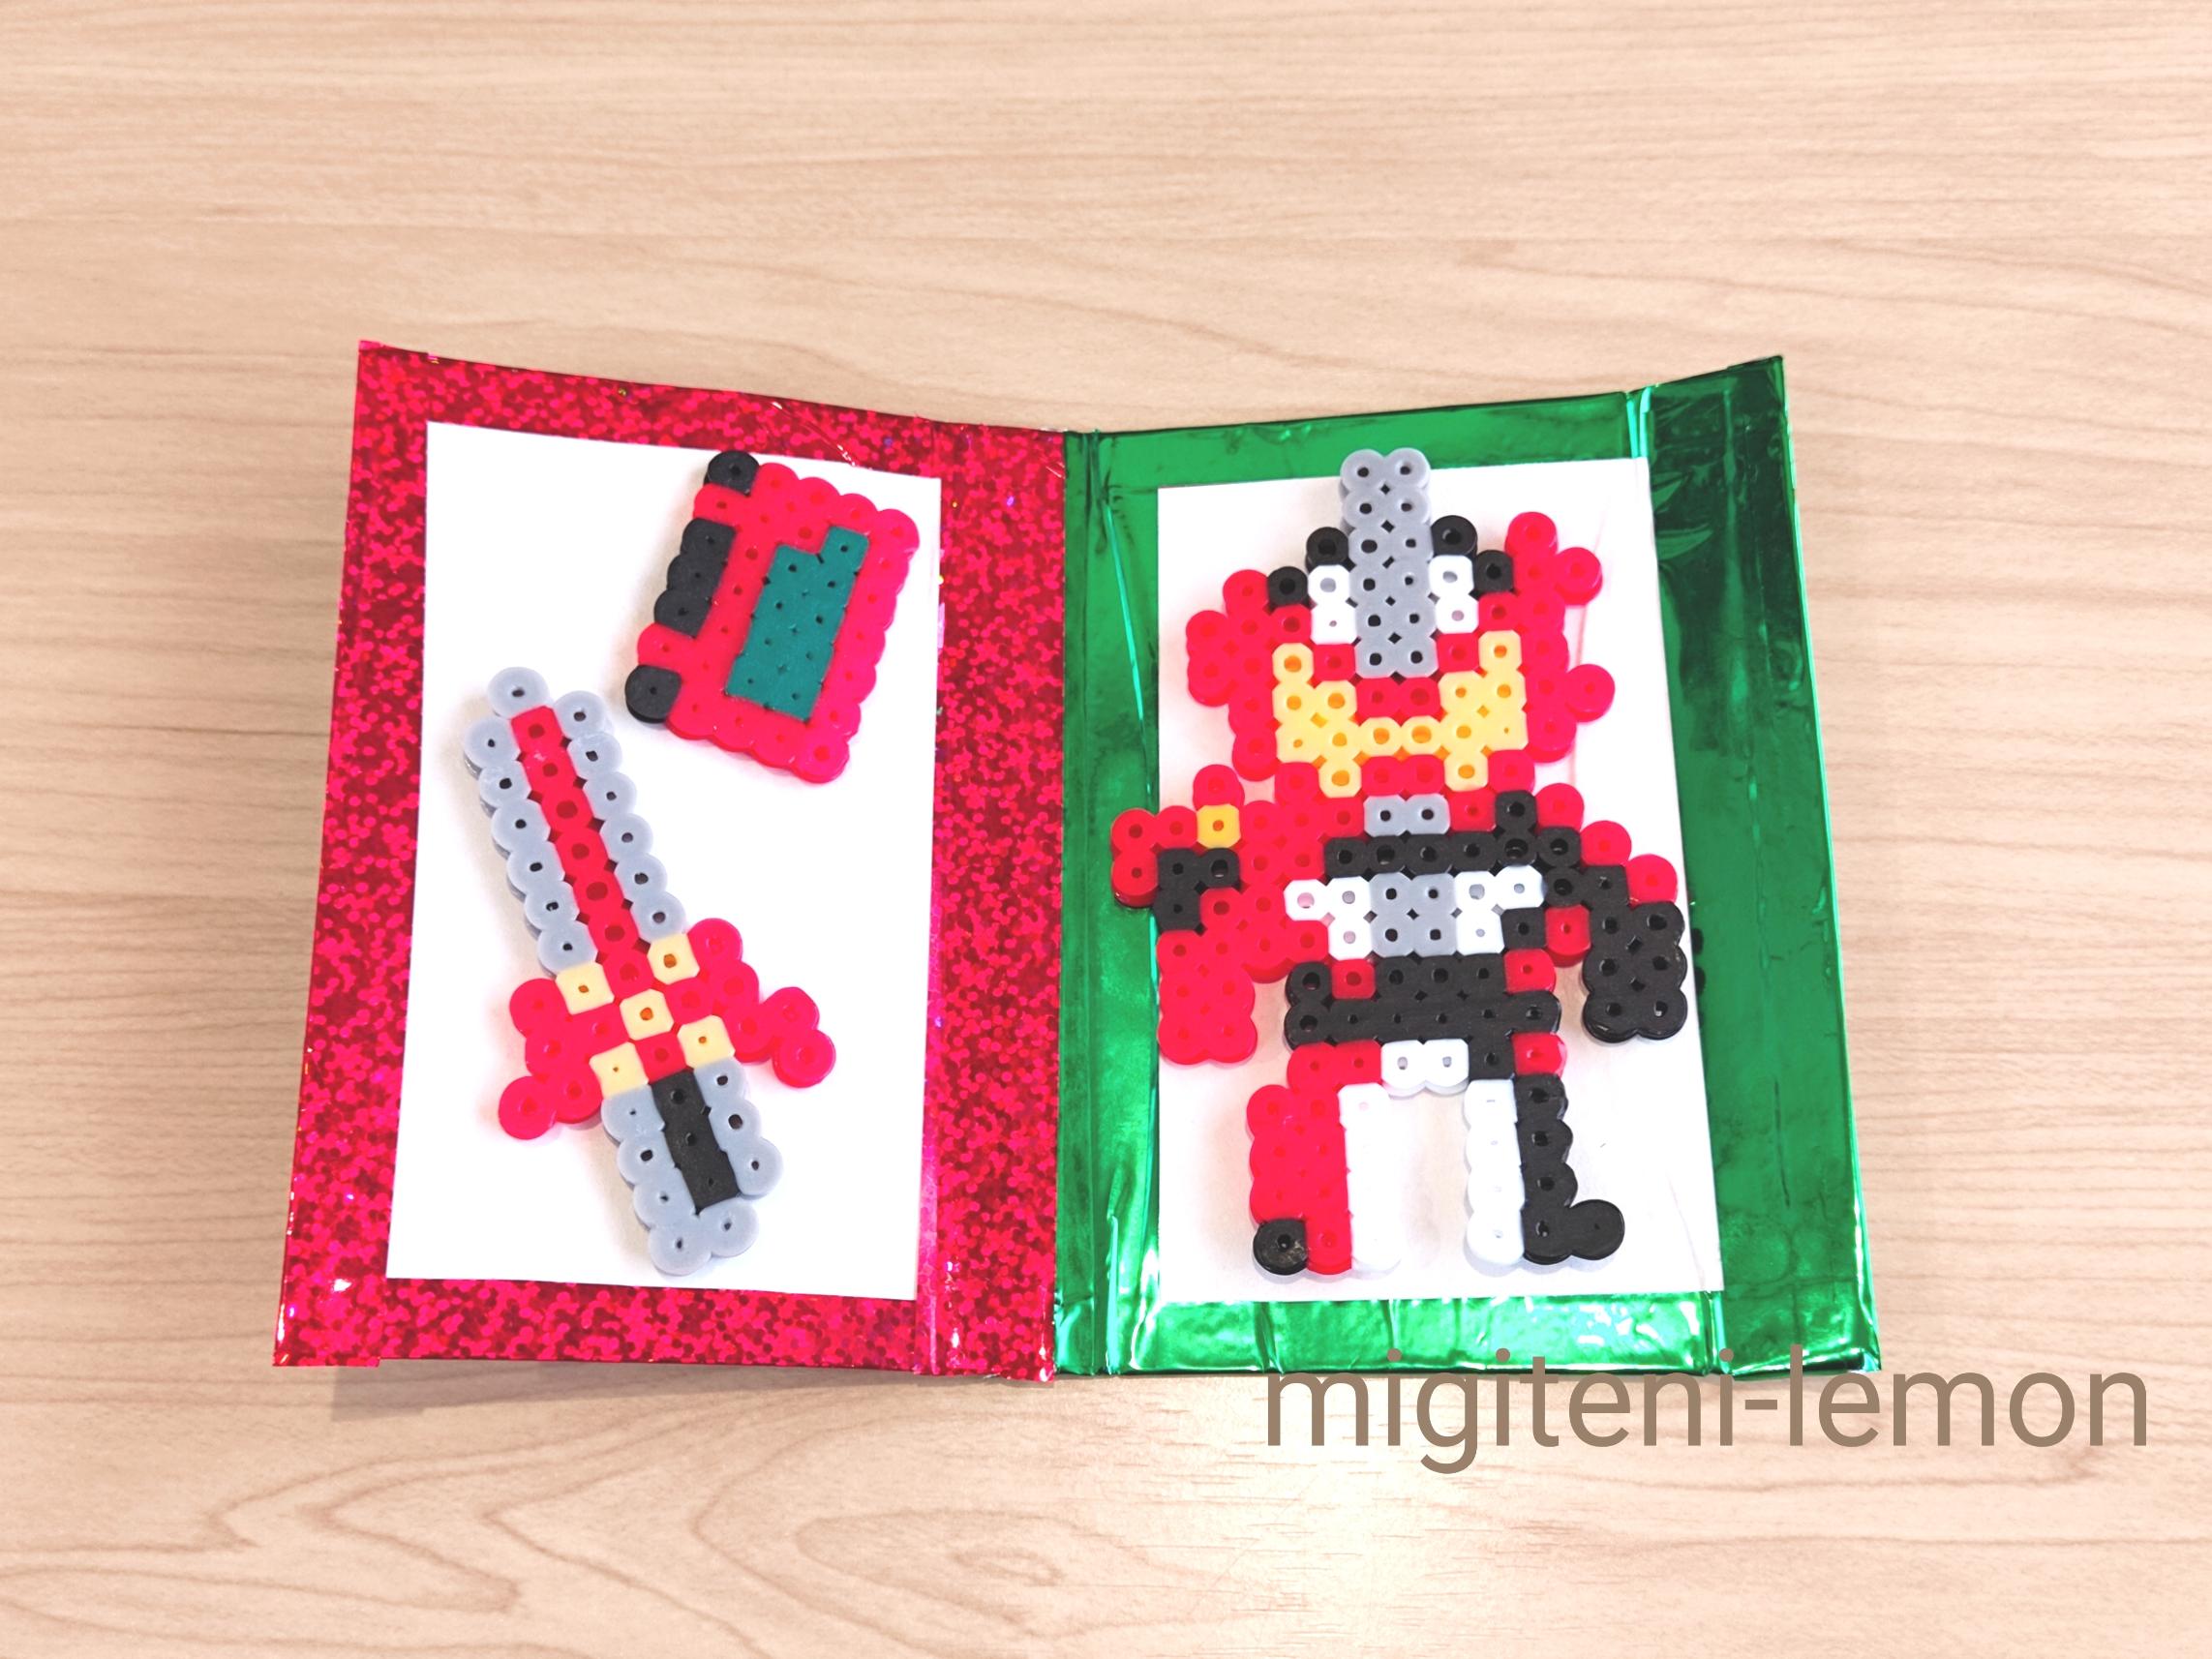 ironbeads-giftbox-cool-handmade